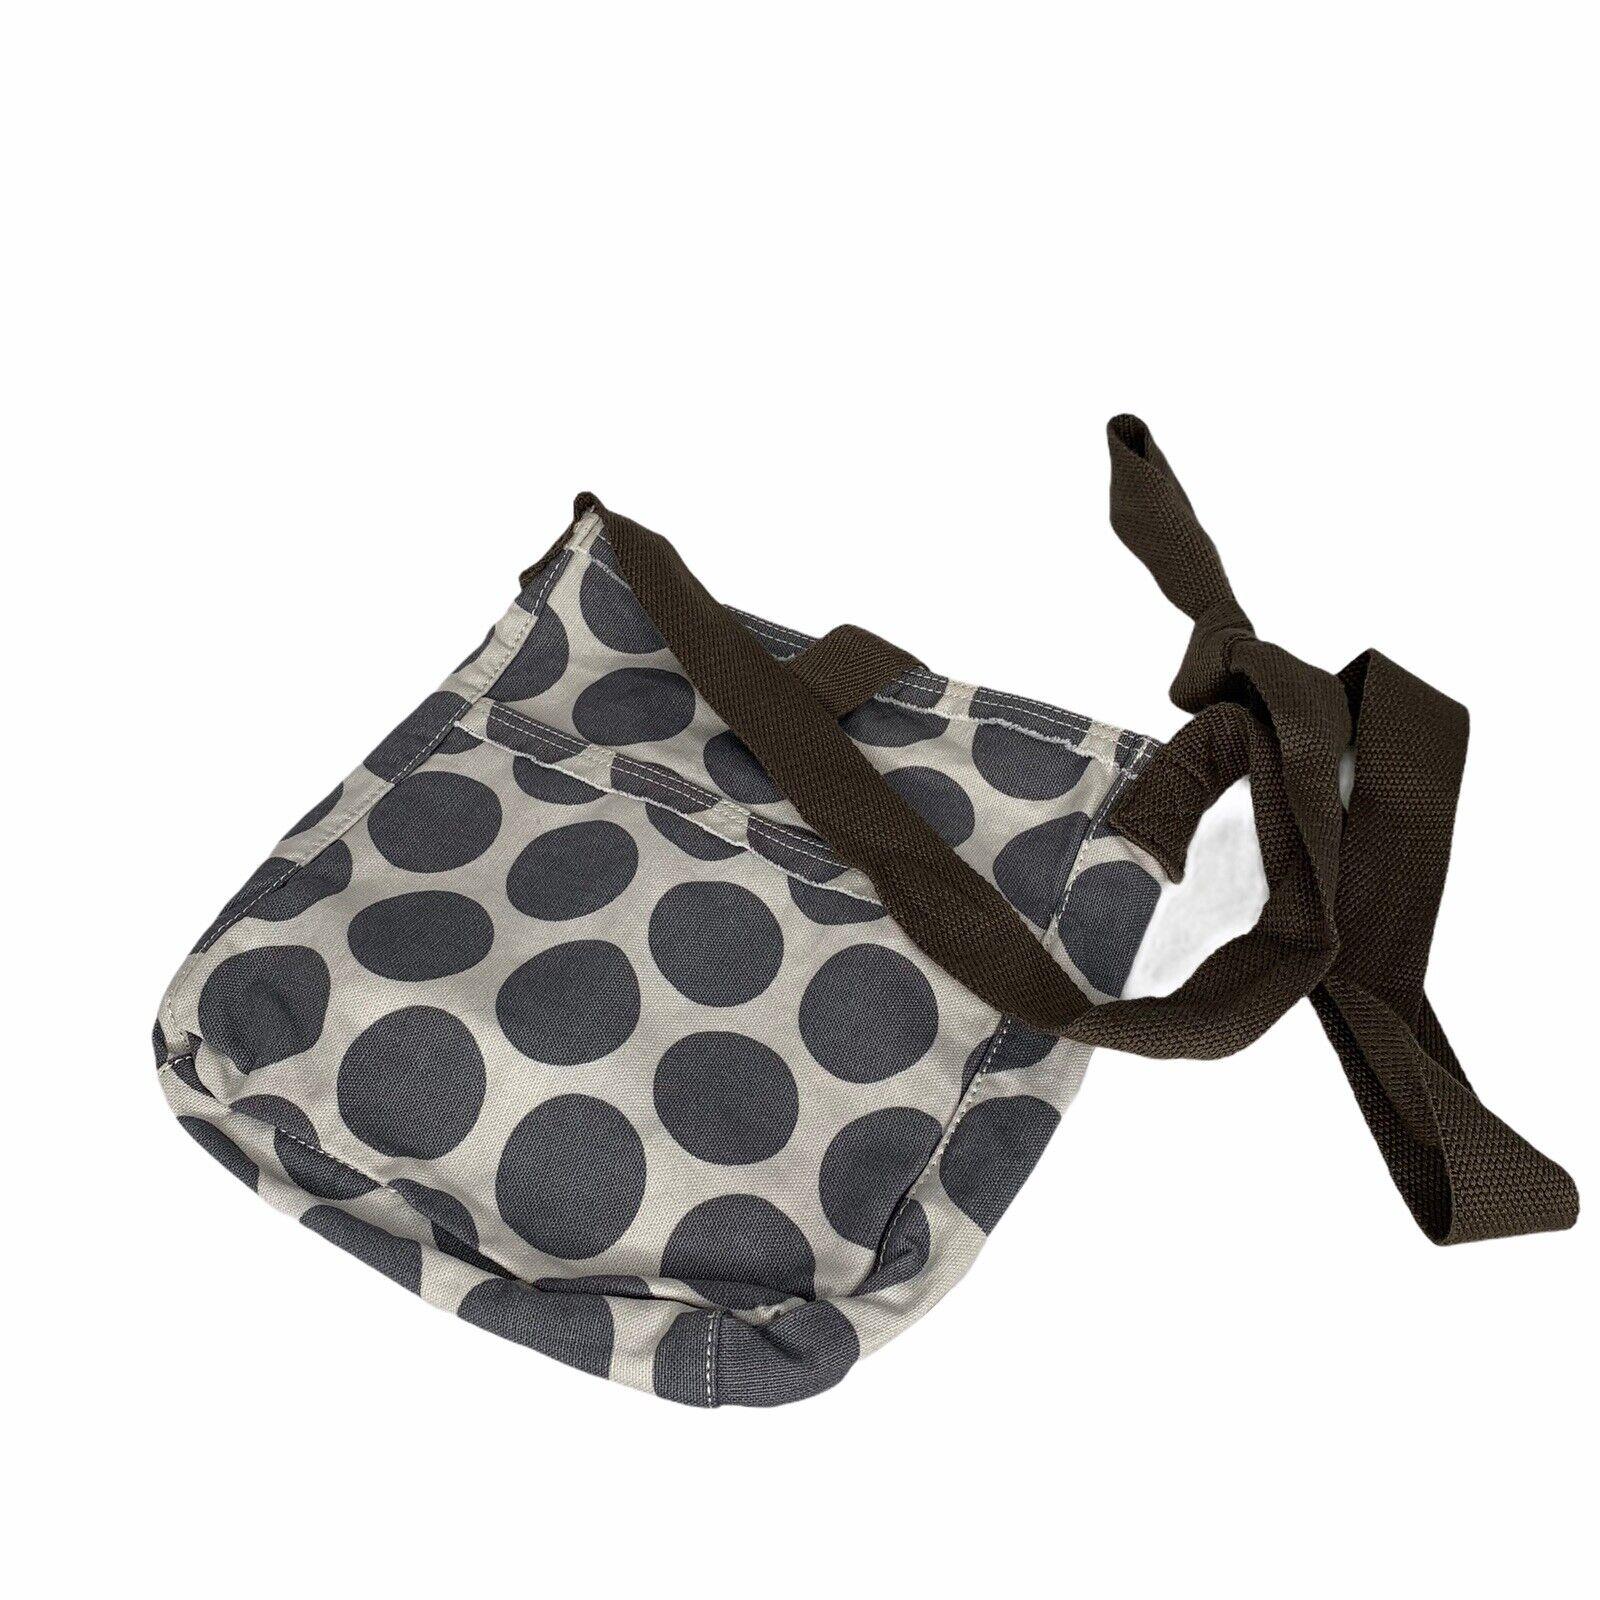 Thirty-One 31 Retro Metro Gray Mod Dot Crossbody Bag Purse Canvas Taupe Strap